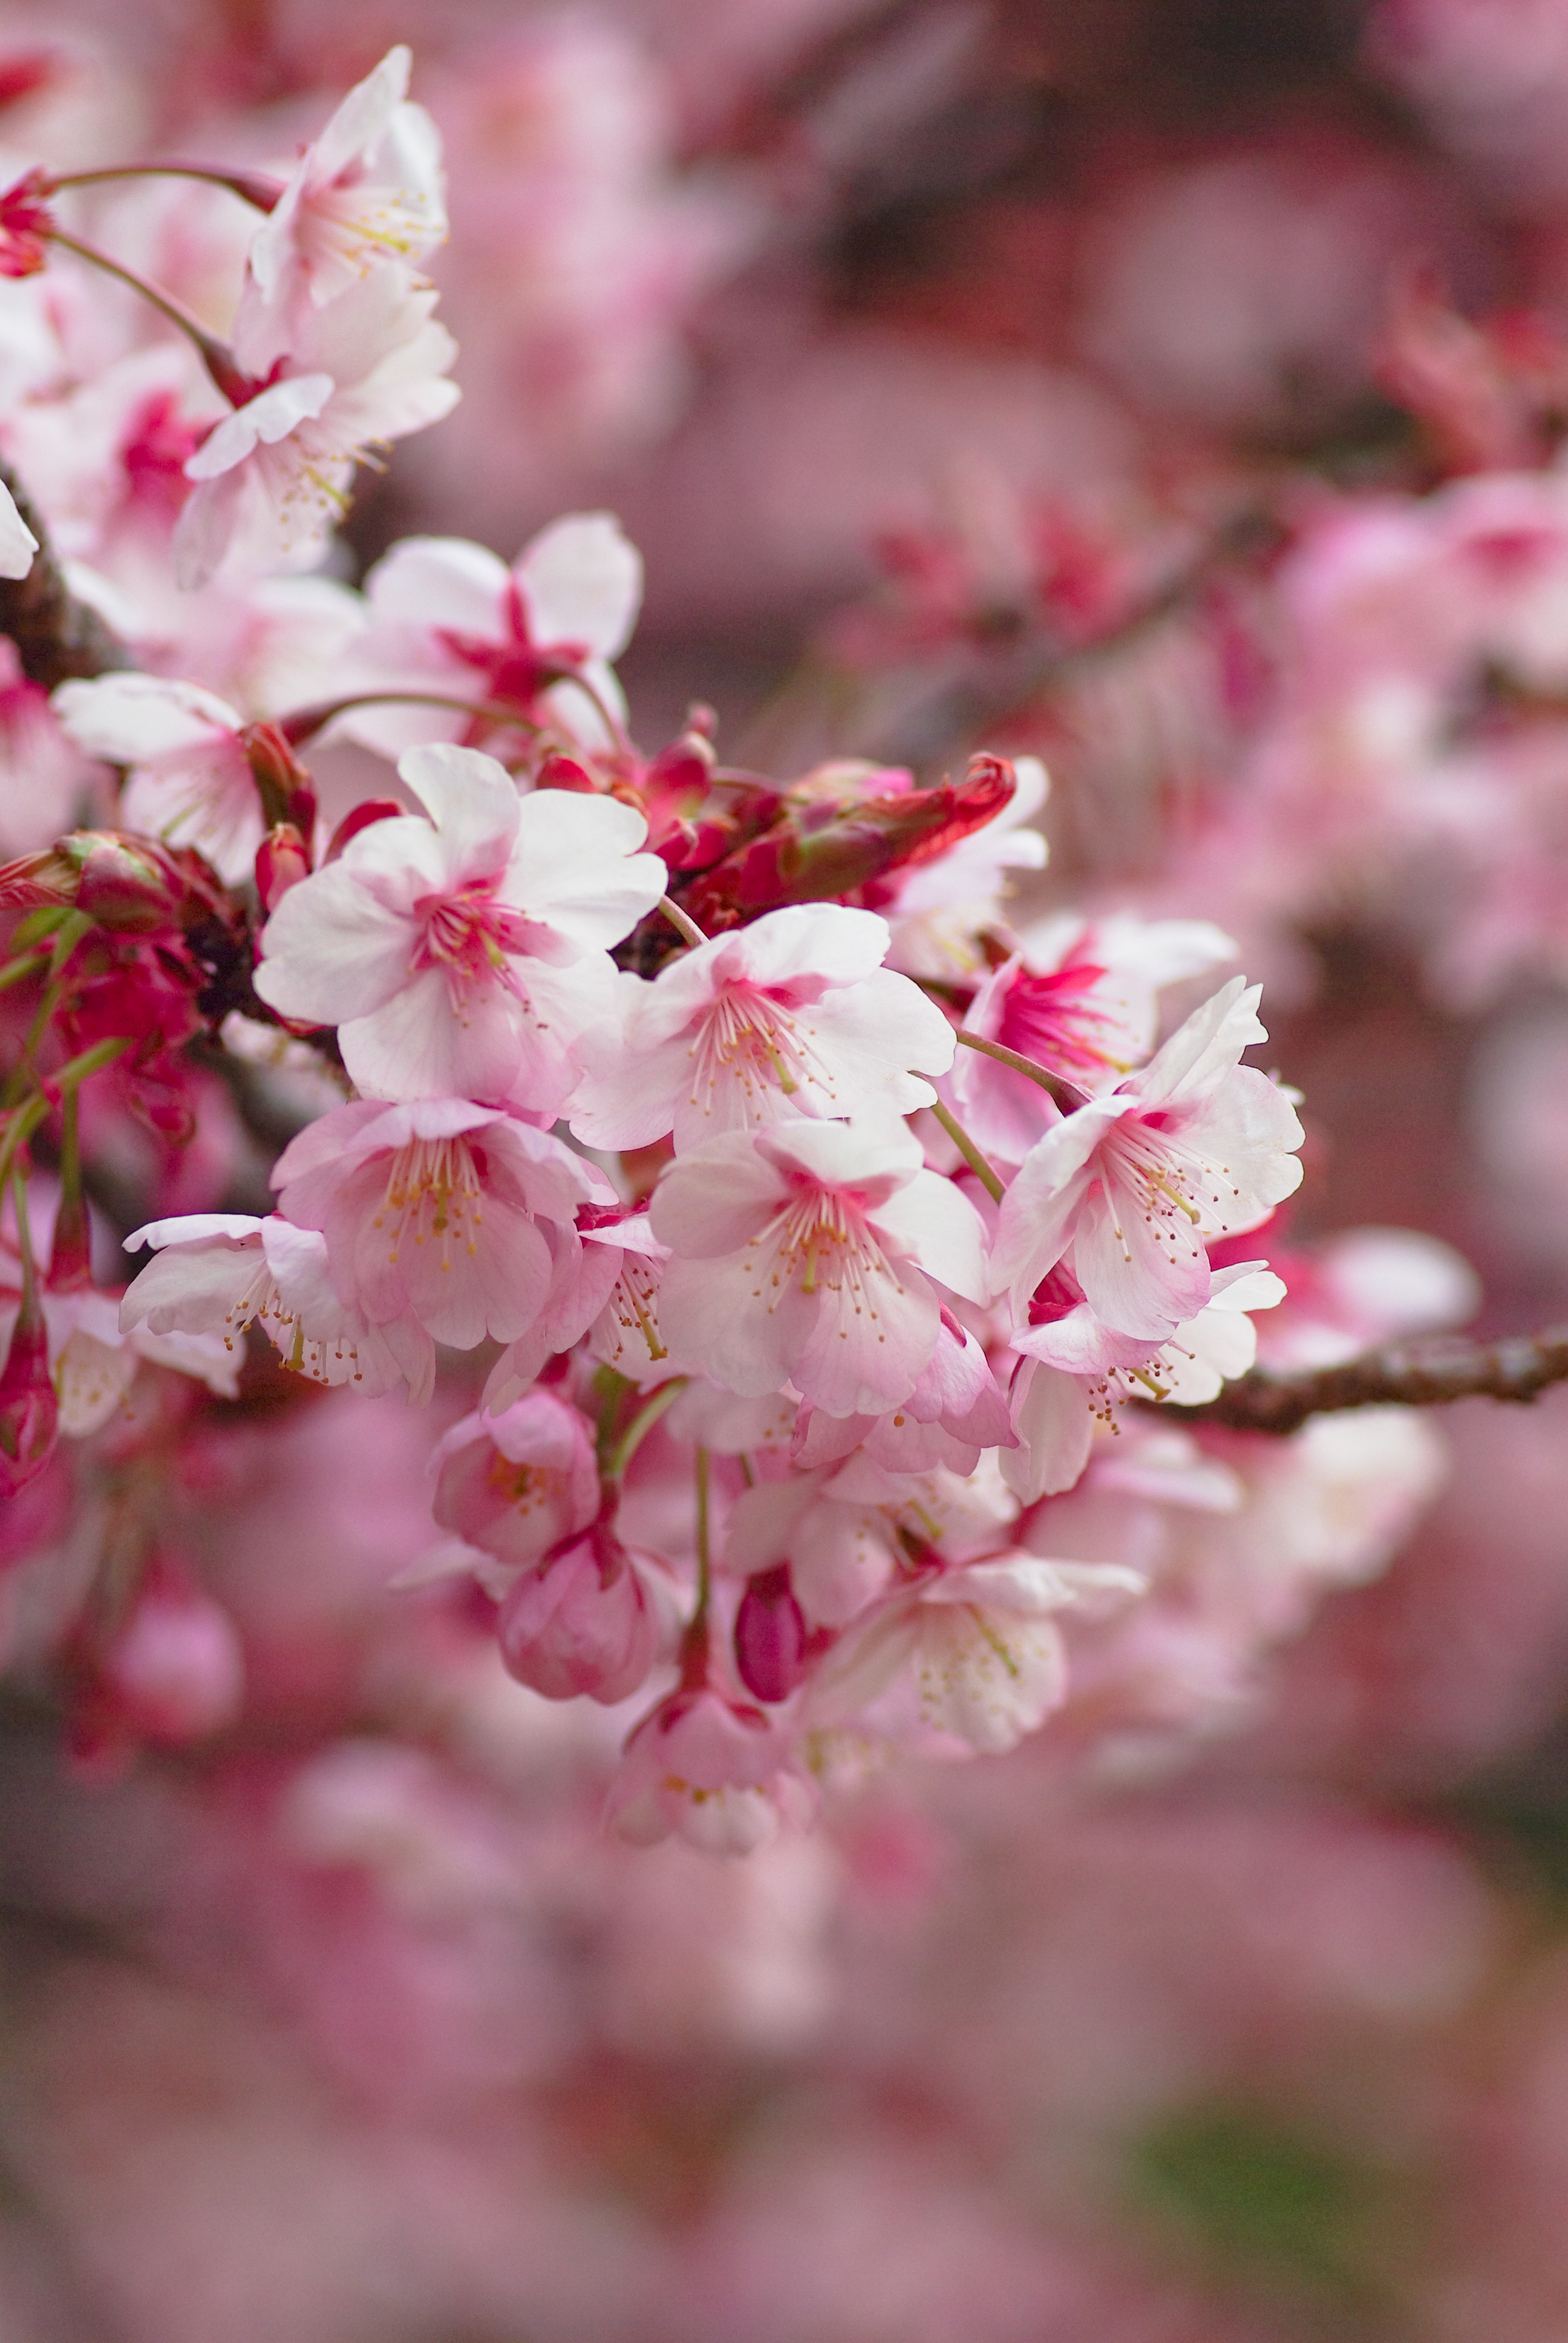 51428 Screensavers and Wallpapers Sakura for phone. Download Flowers, Sakura, Blur, Smooth, Bloom, Flowering, Branch pictures for free